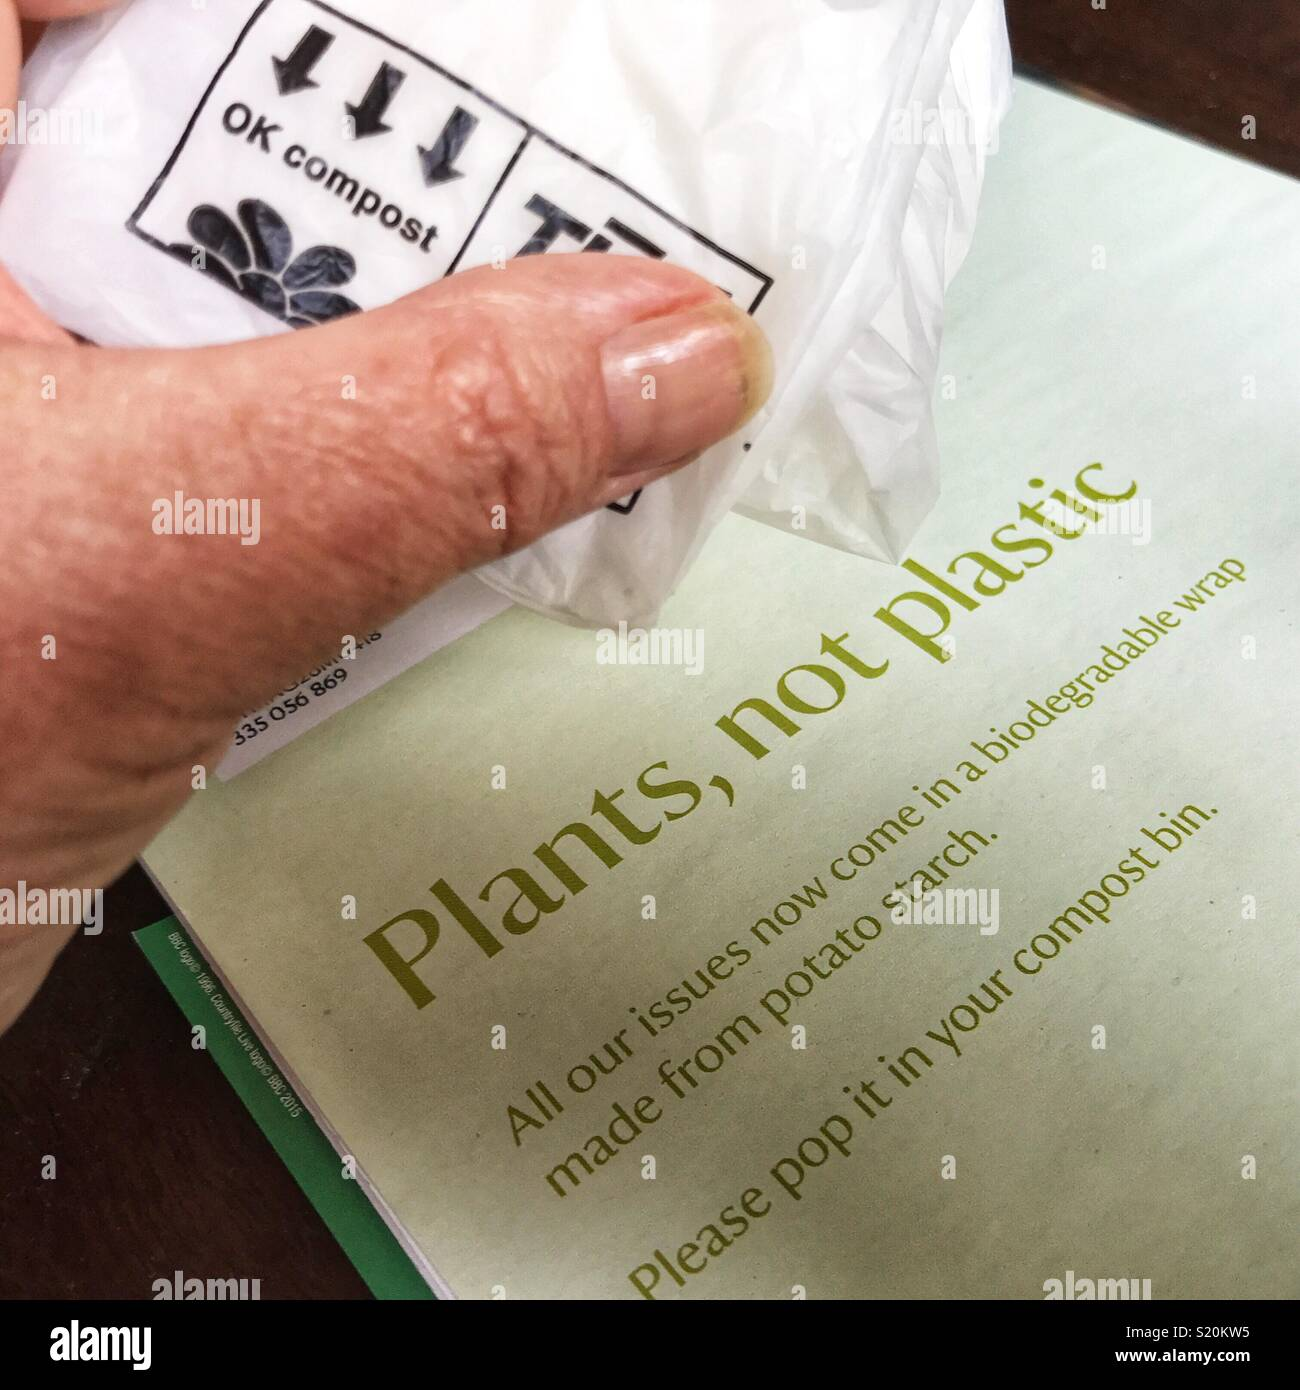 biodegradable plastic from potato starch